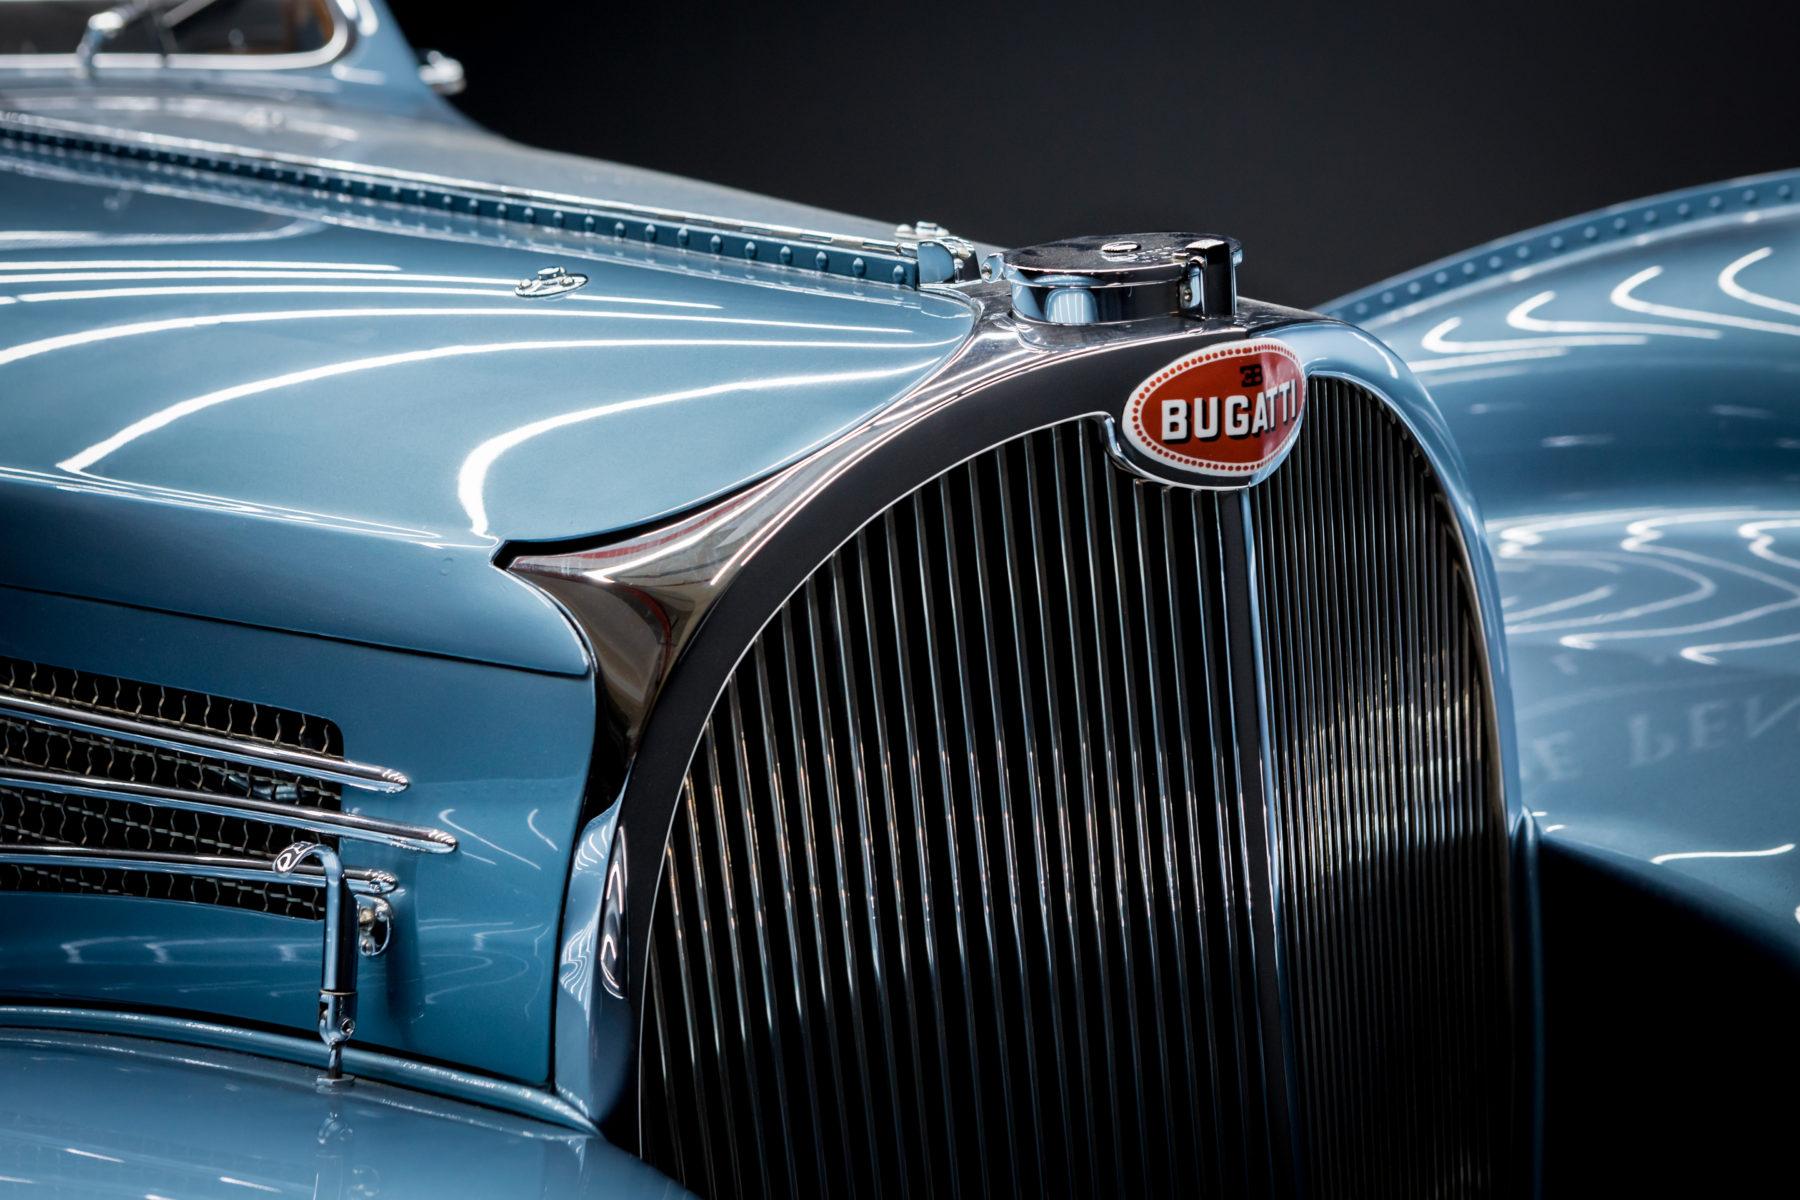 la bugatti type 57sc atlantic d croche le prix peninsula classics best of the best le mag auto. Black Bedroom Furniture Sets. Home Design Ideas